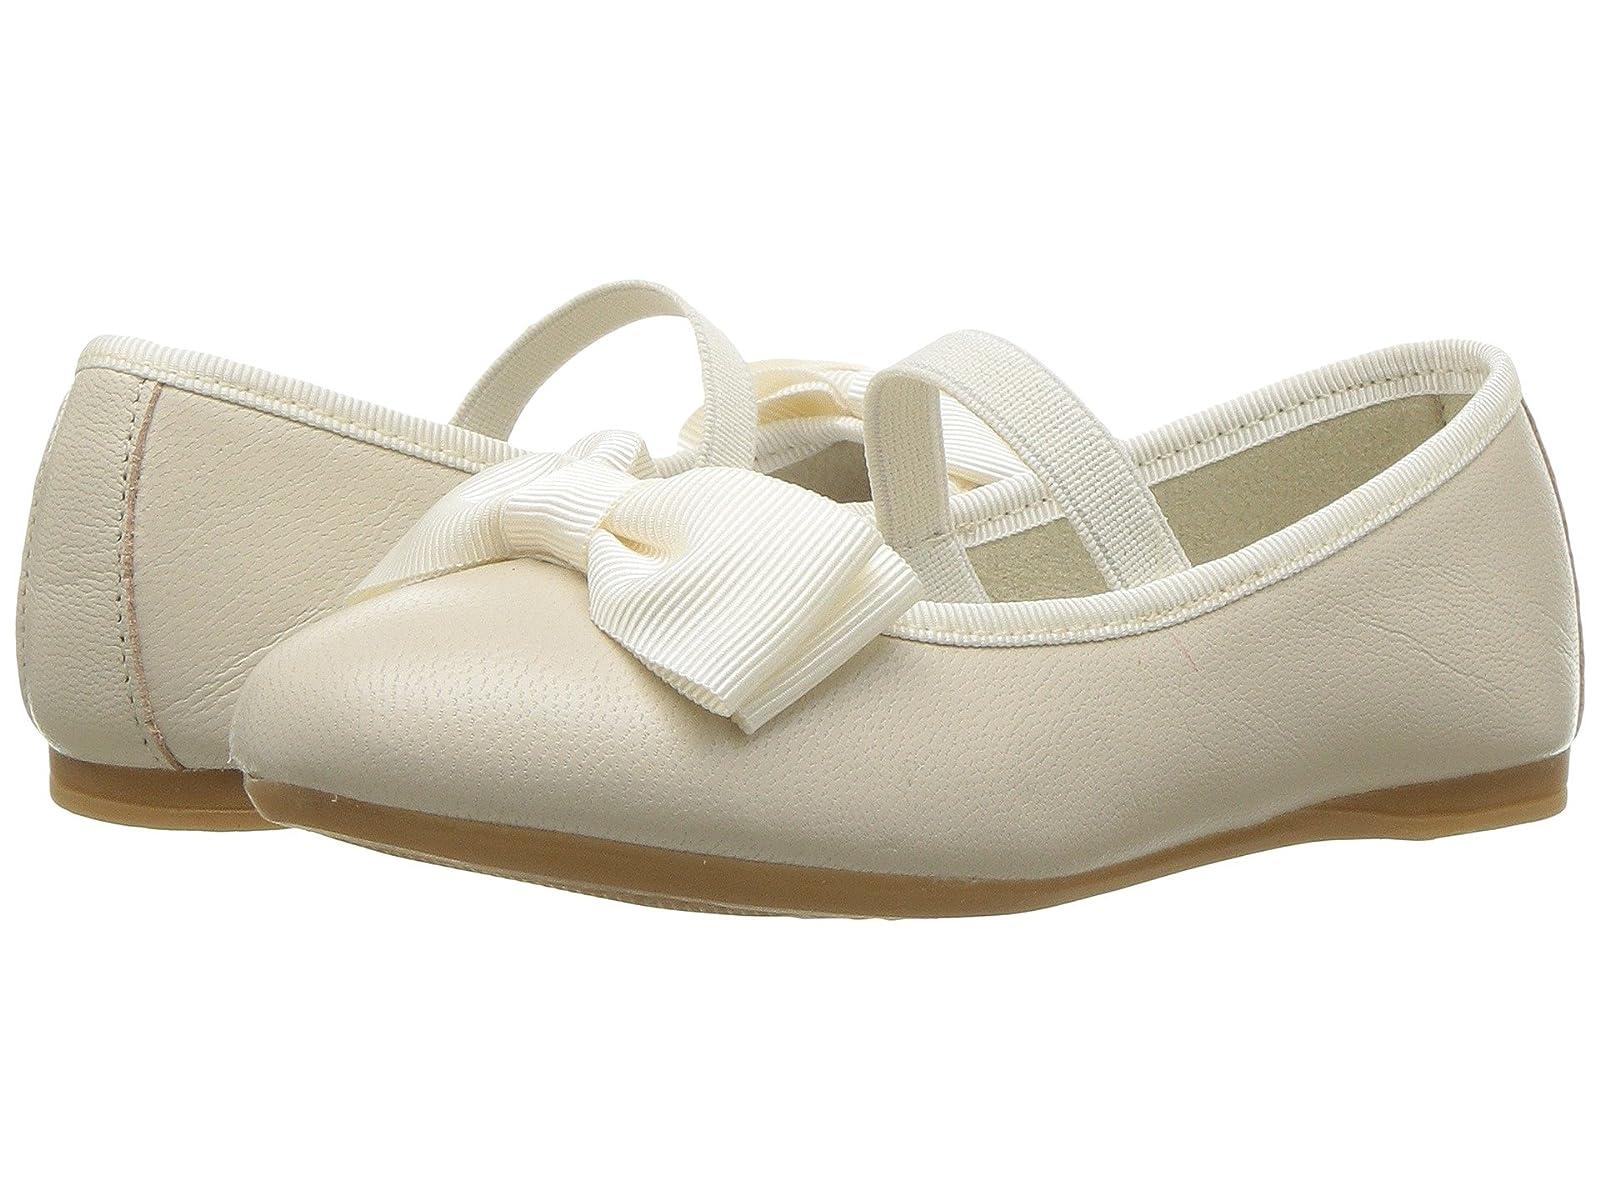 Conguitos IV124088 (Toddler/Little Kid/Big Kid)Atmospheric grades have affordable shoes